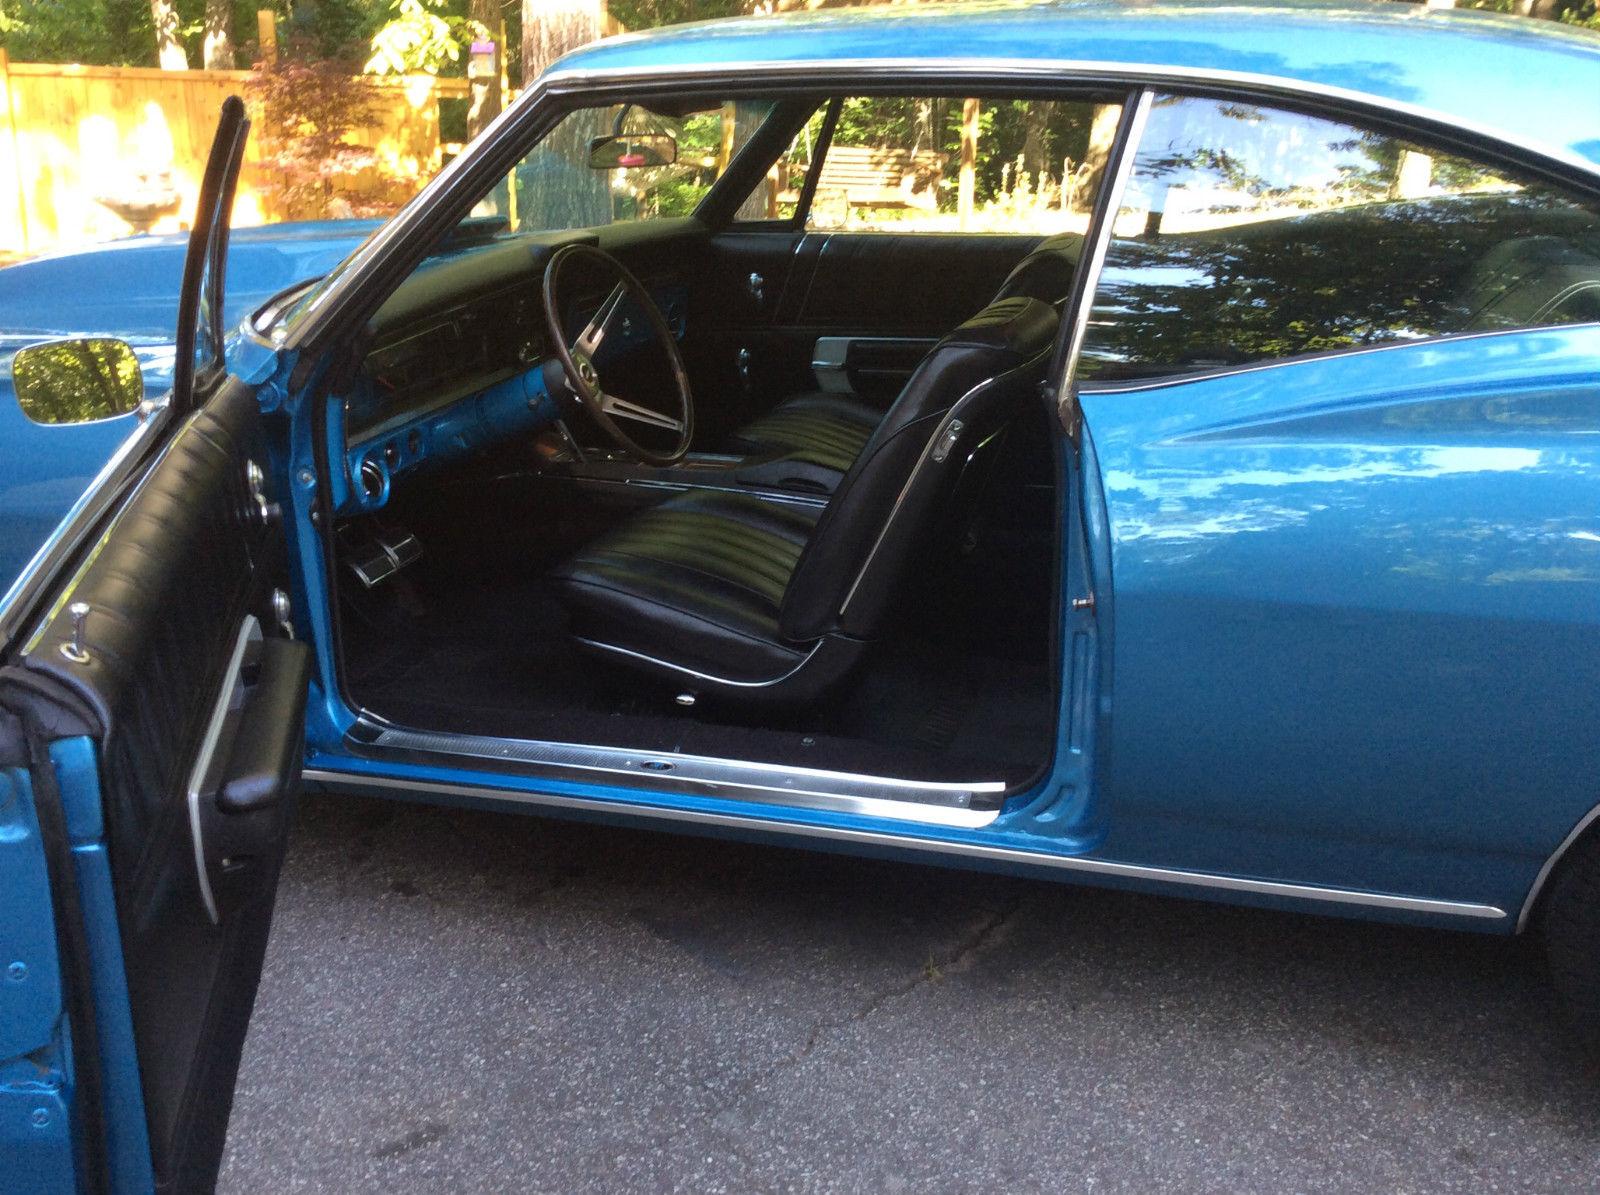 Blue 1968 Chevy Impala Ss Classic Chevrolet For Sale 427 Prevnext